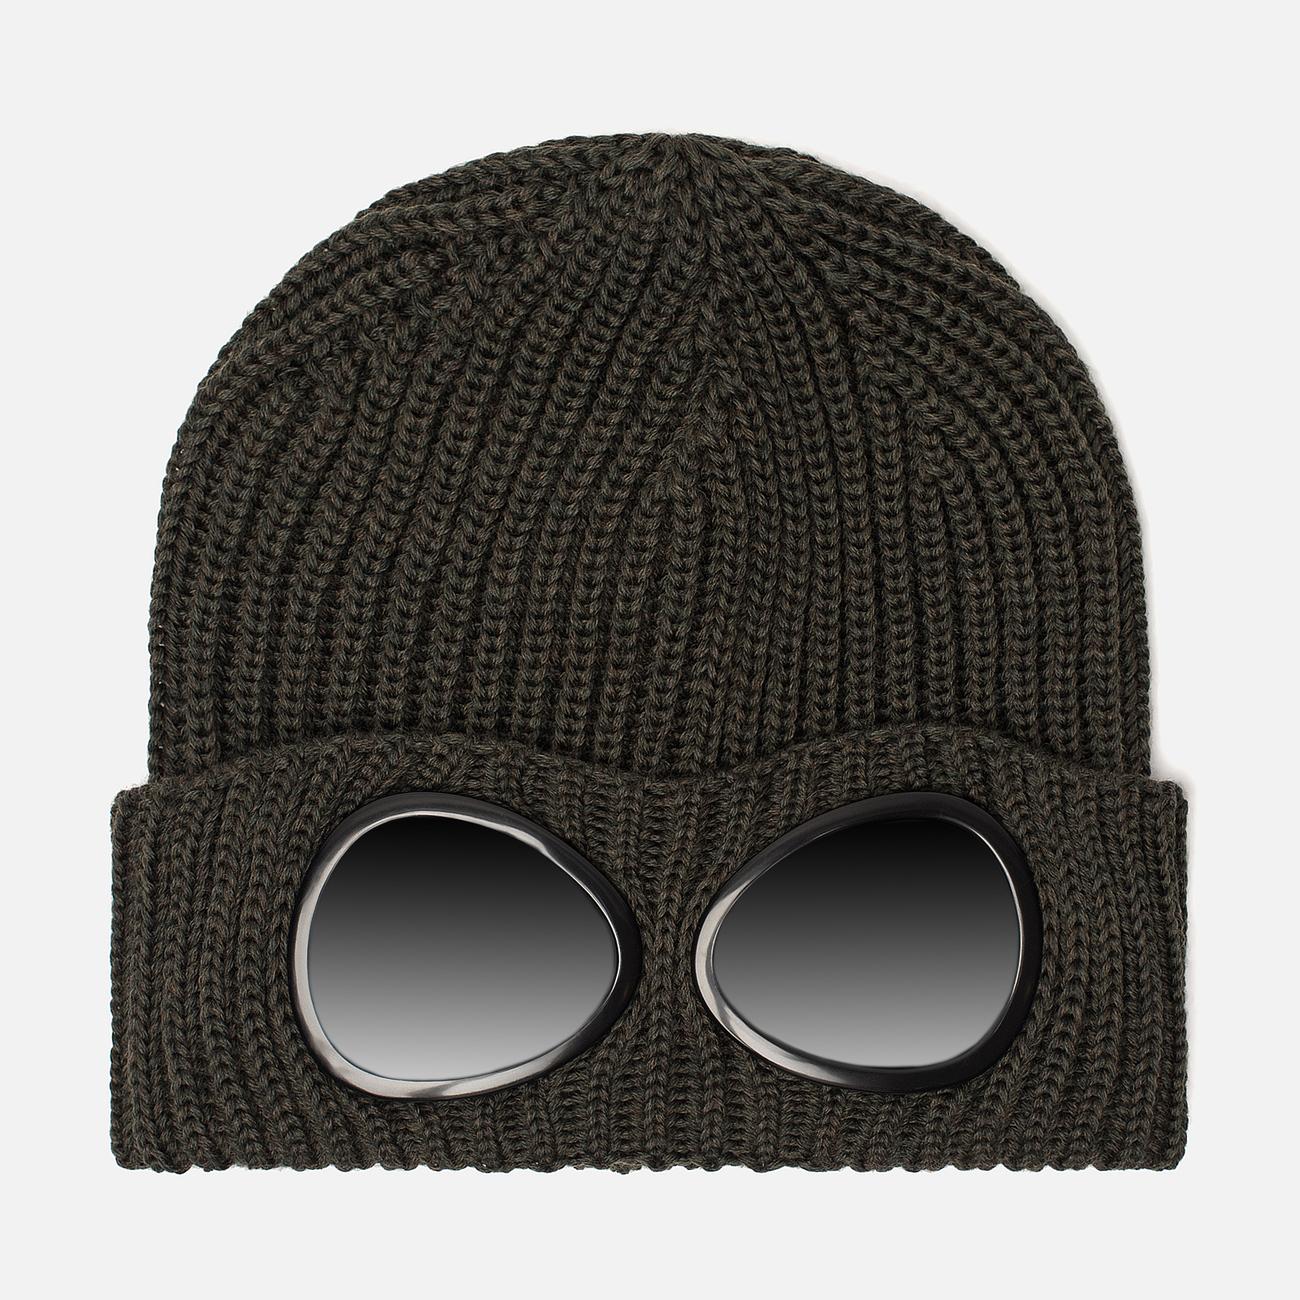 Шапка C.P. Company Wool Goggle Dark Olive